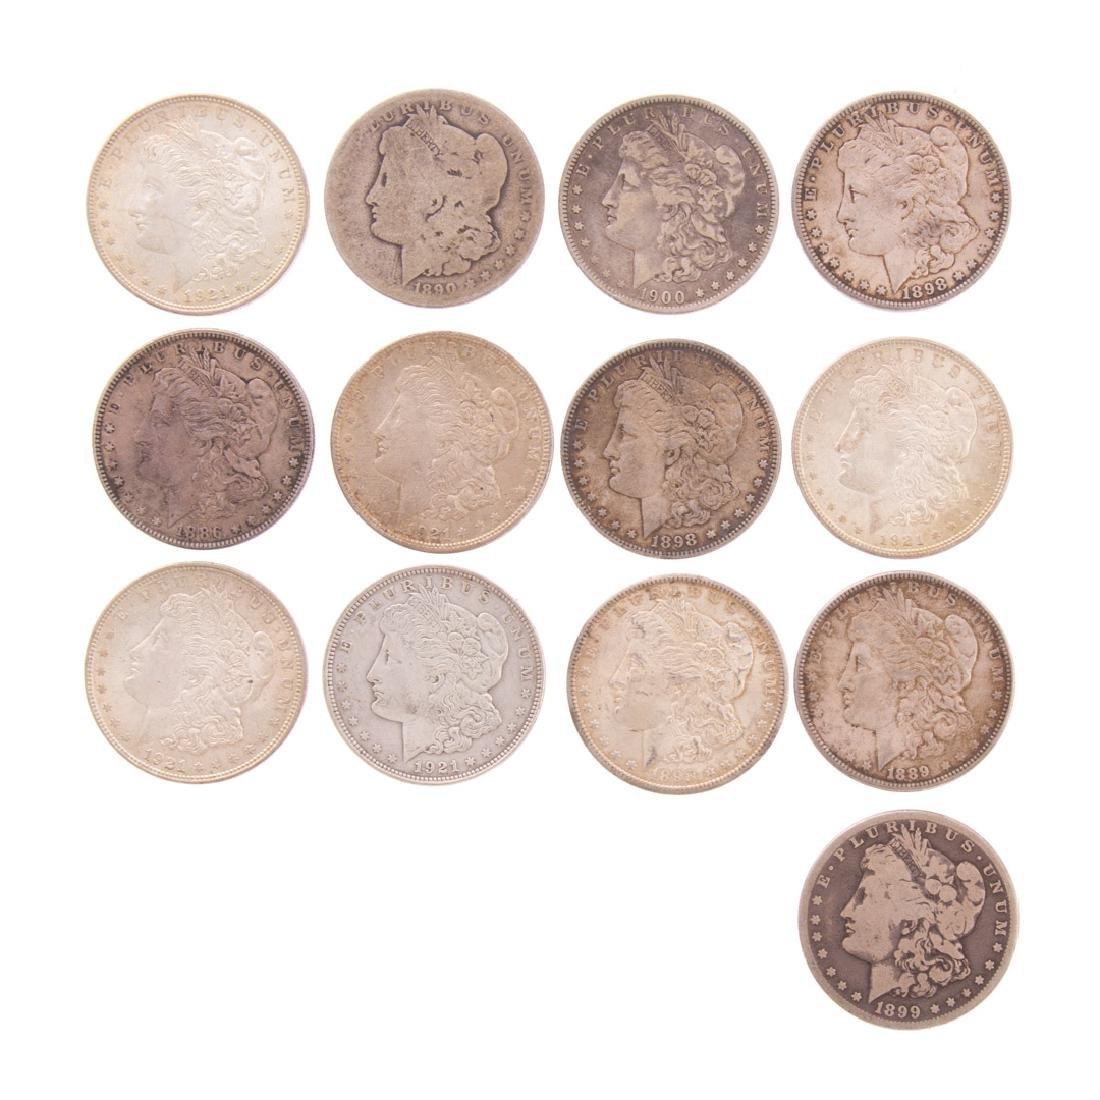 [US] 13 Morgan Silver Dollars